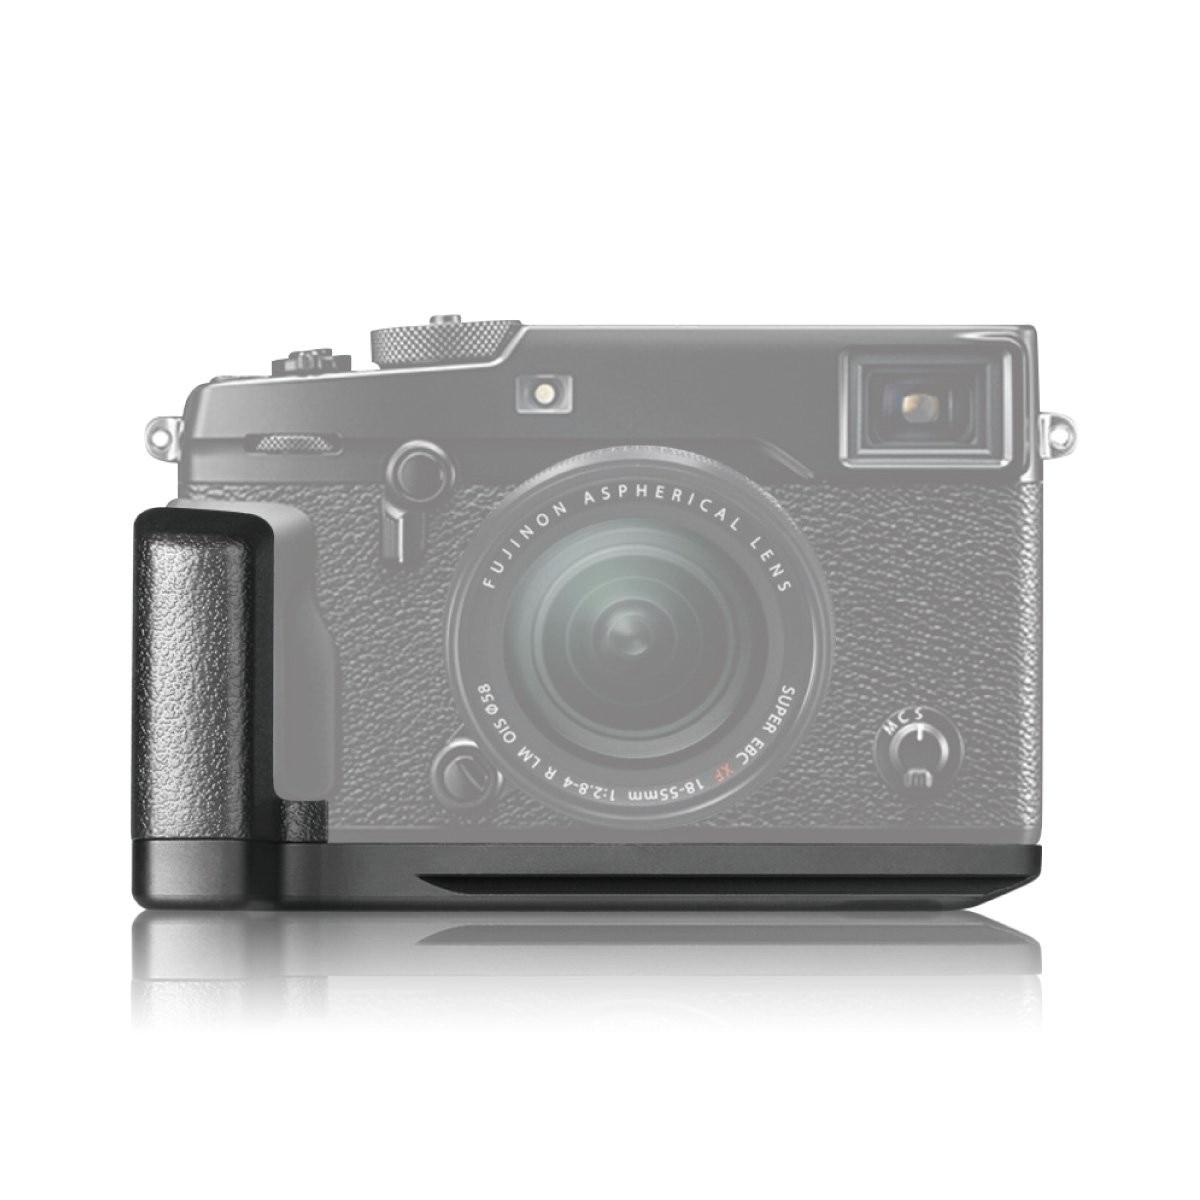 Meike MK XPro2G Handle Metal MHG XPRO2 Camera Hand Grip for Fujifilm X Pro2 XPro 2